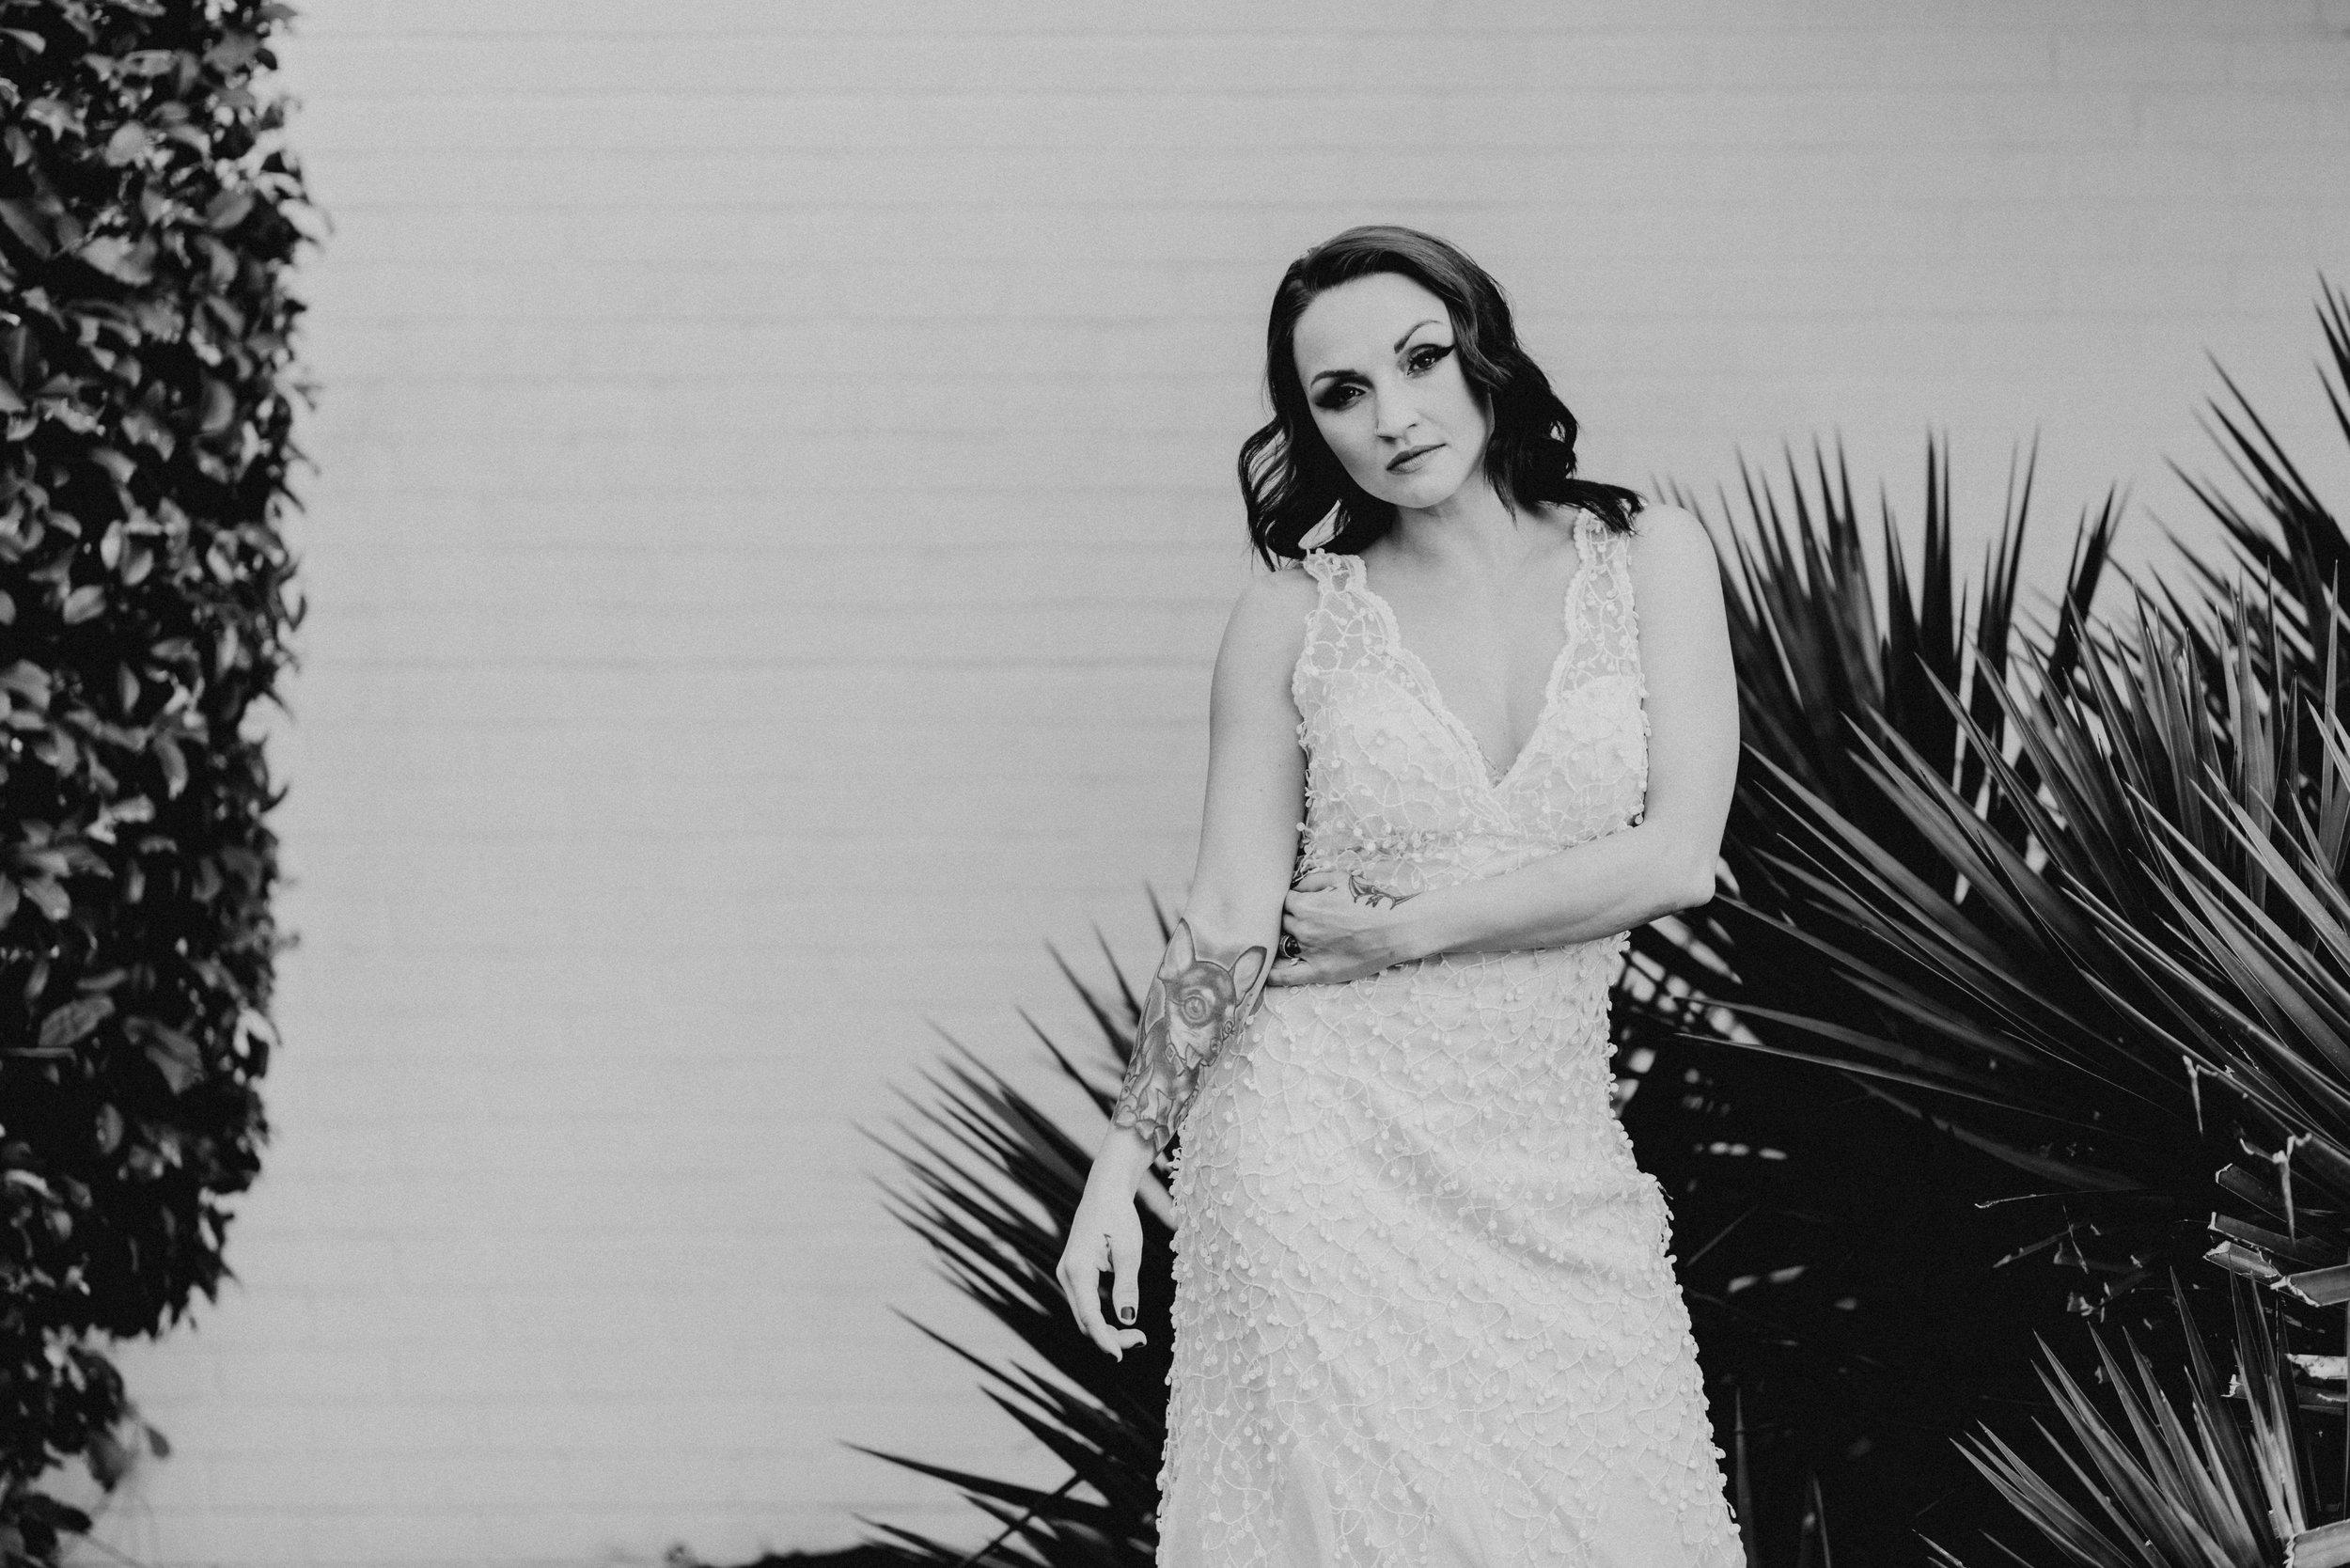 bonnie styled bridal portraits by wilde company-4.jpg